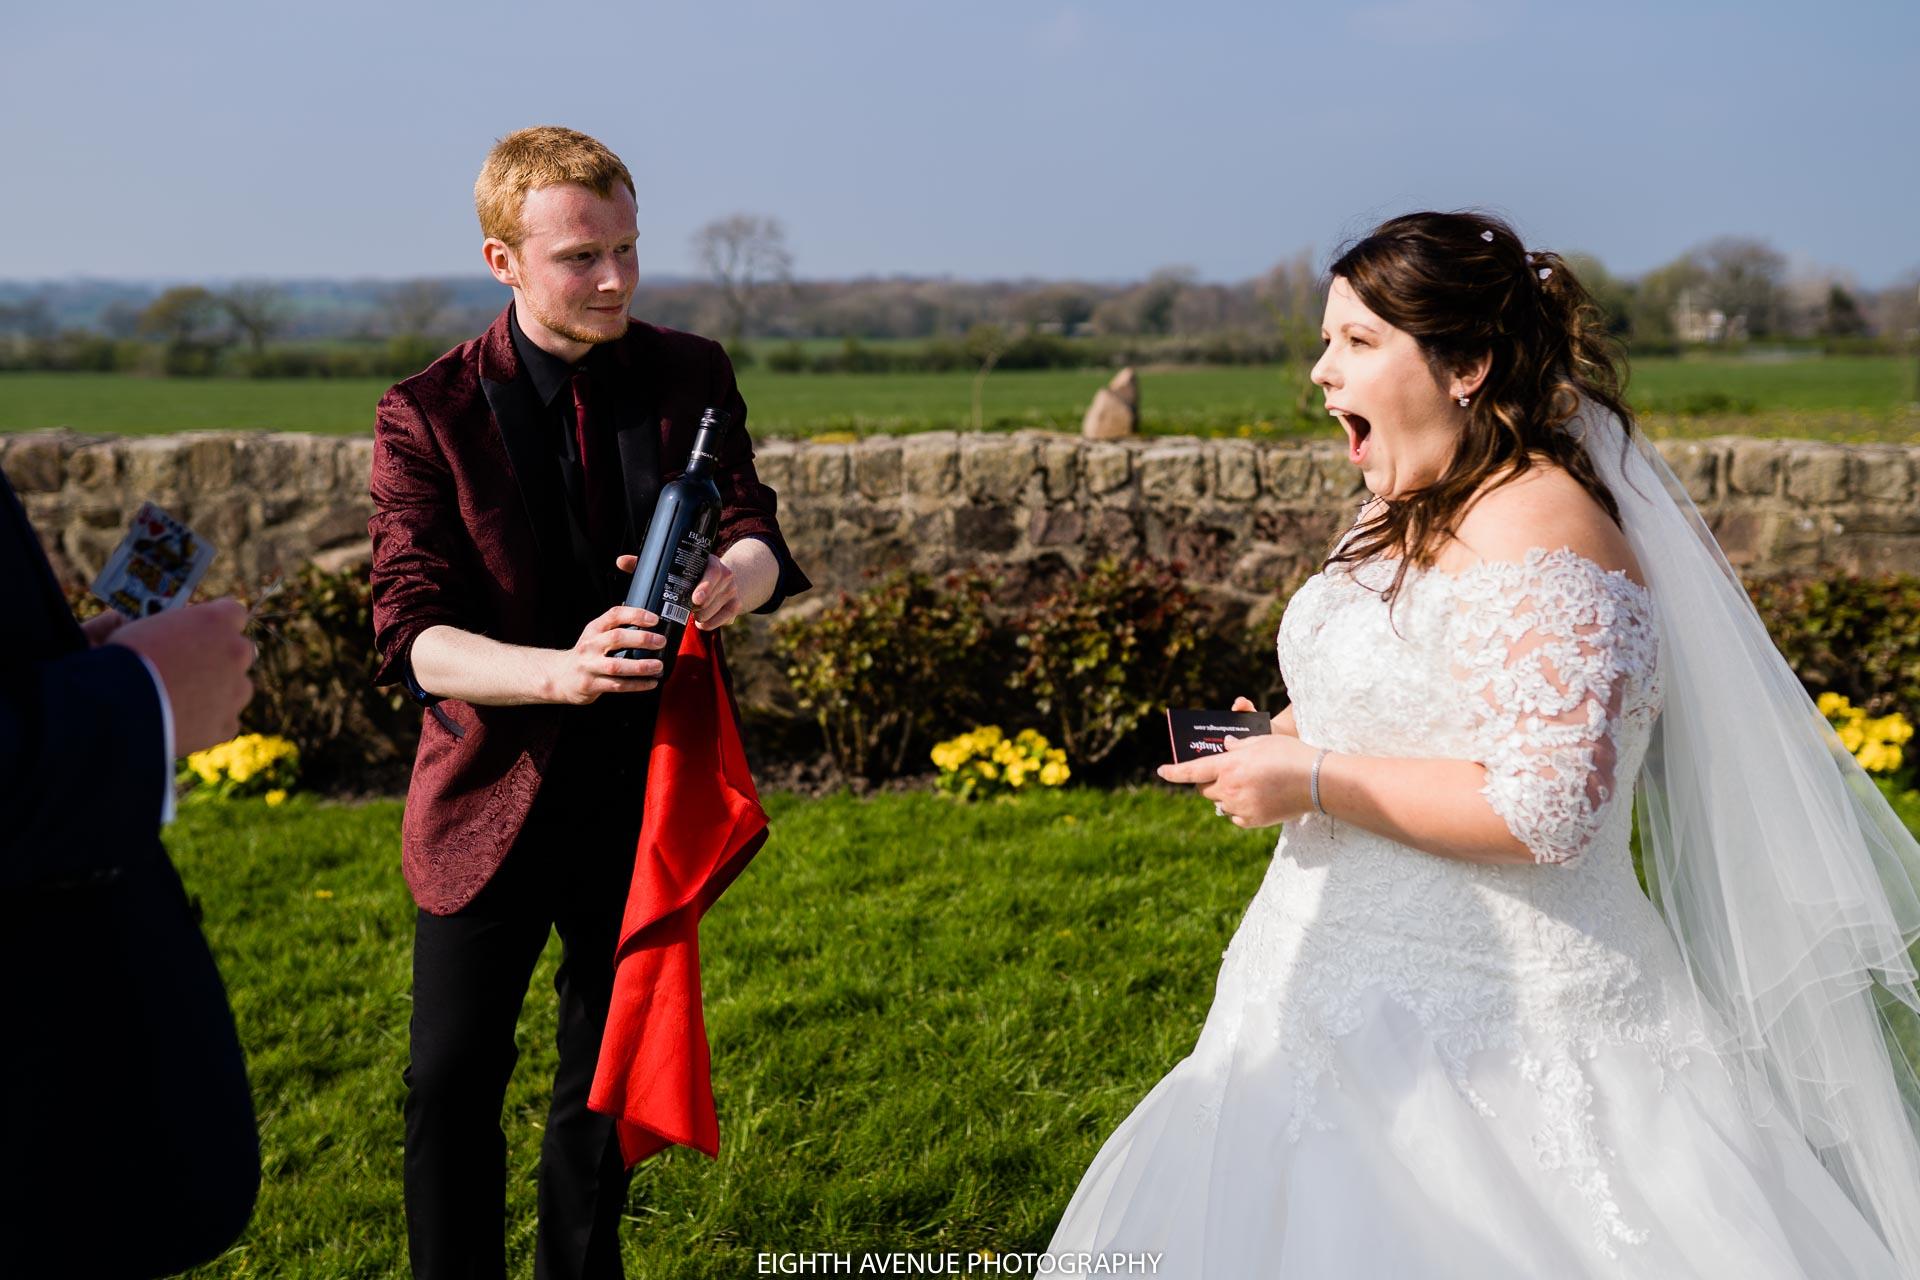 zanda magic performing to bride